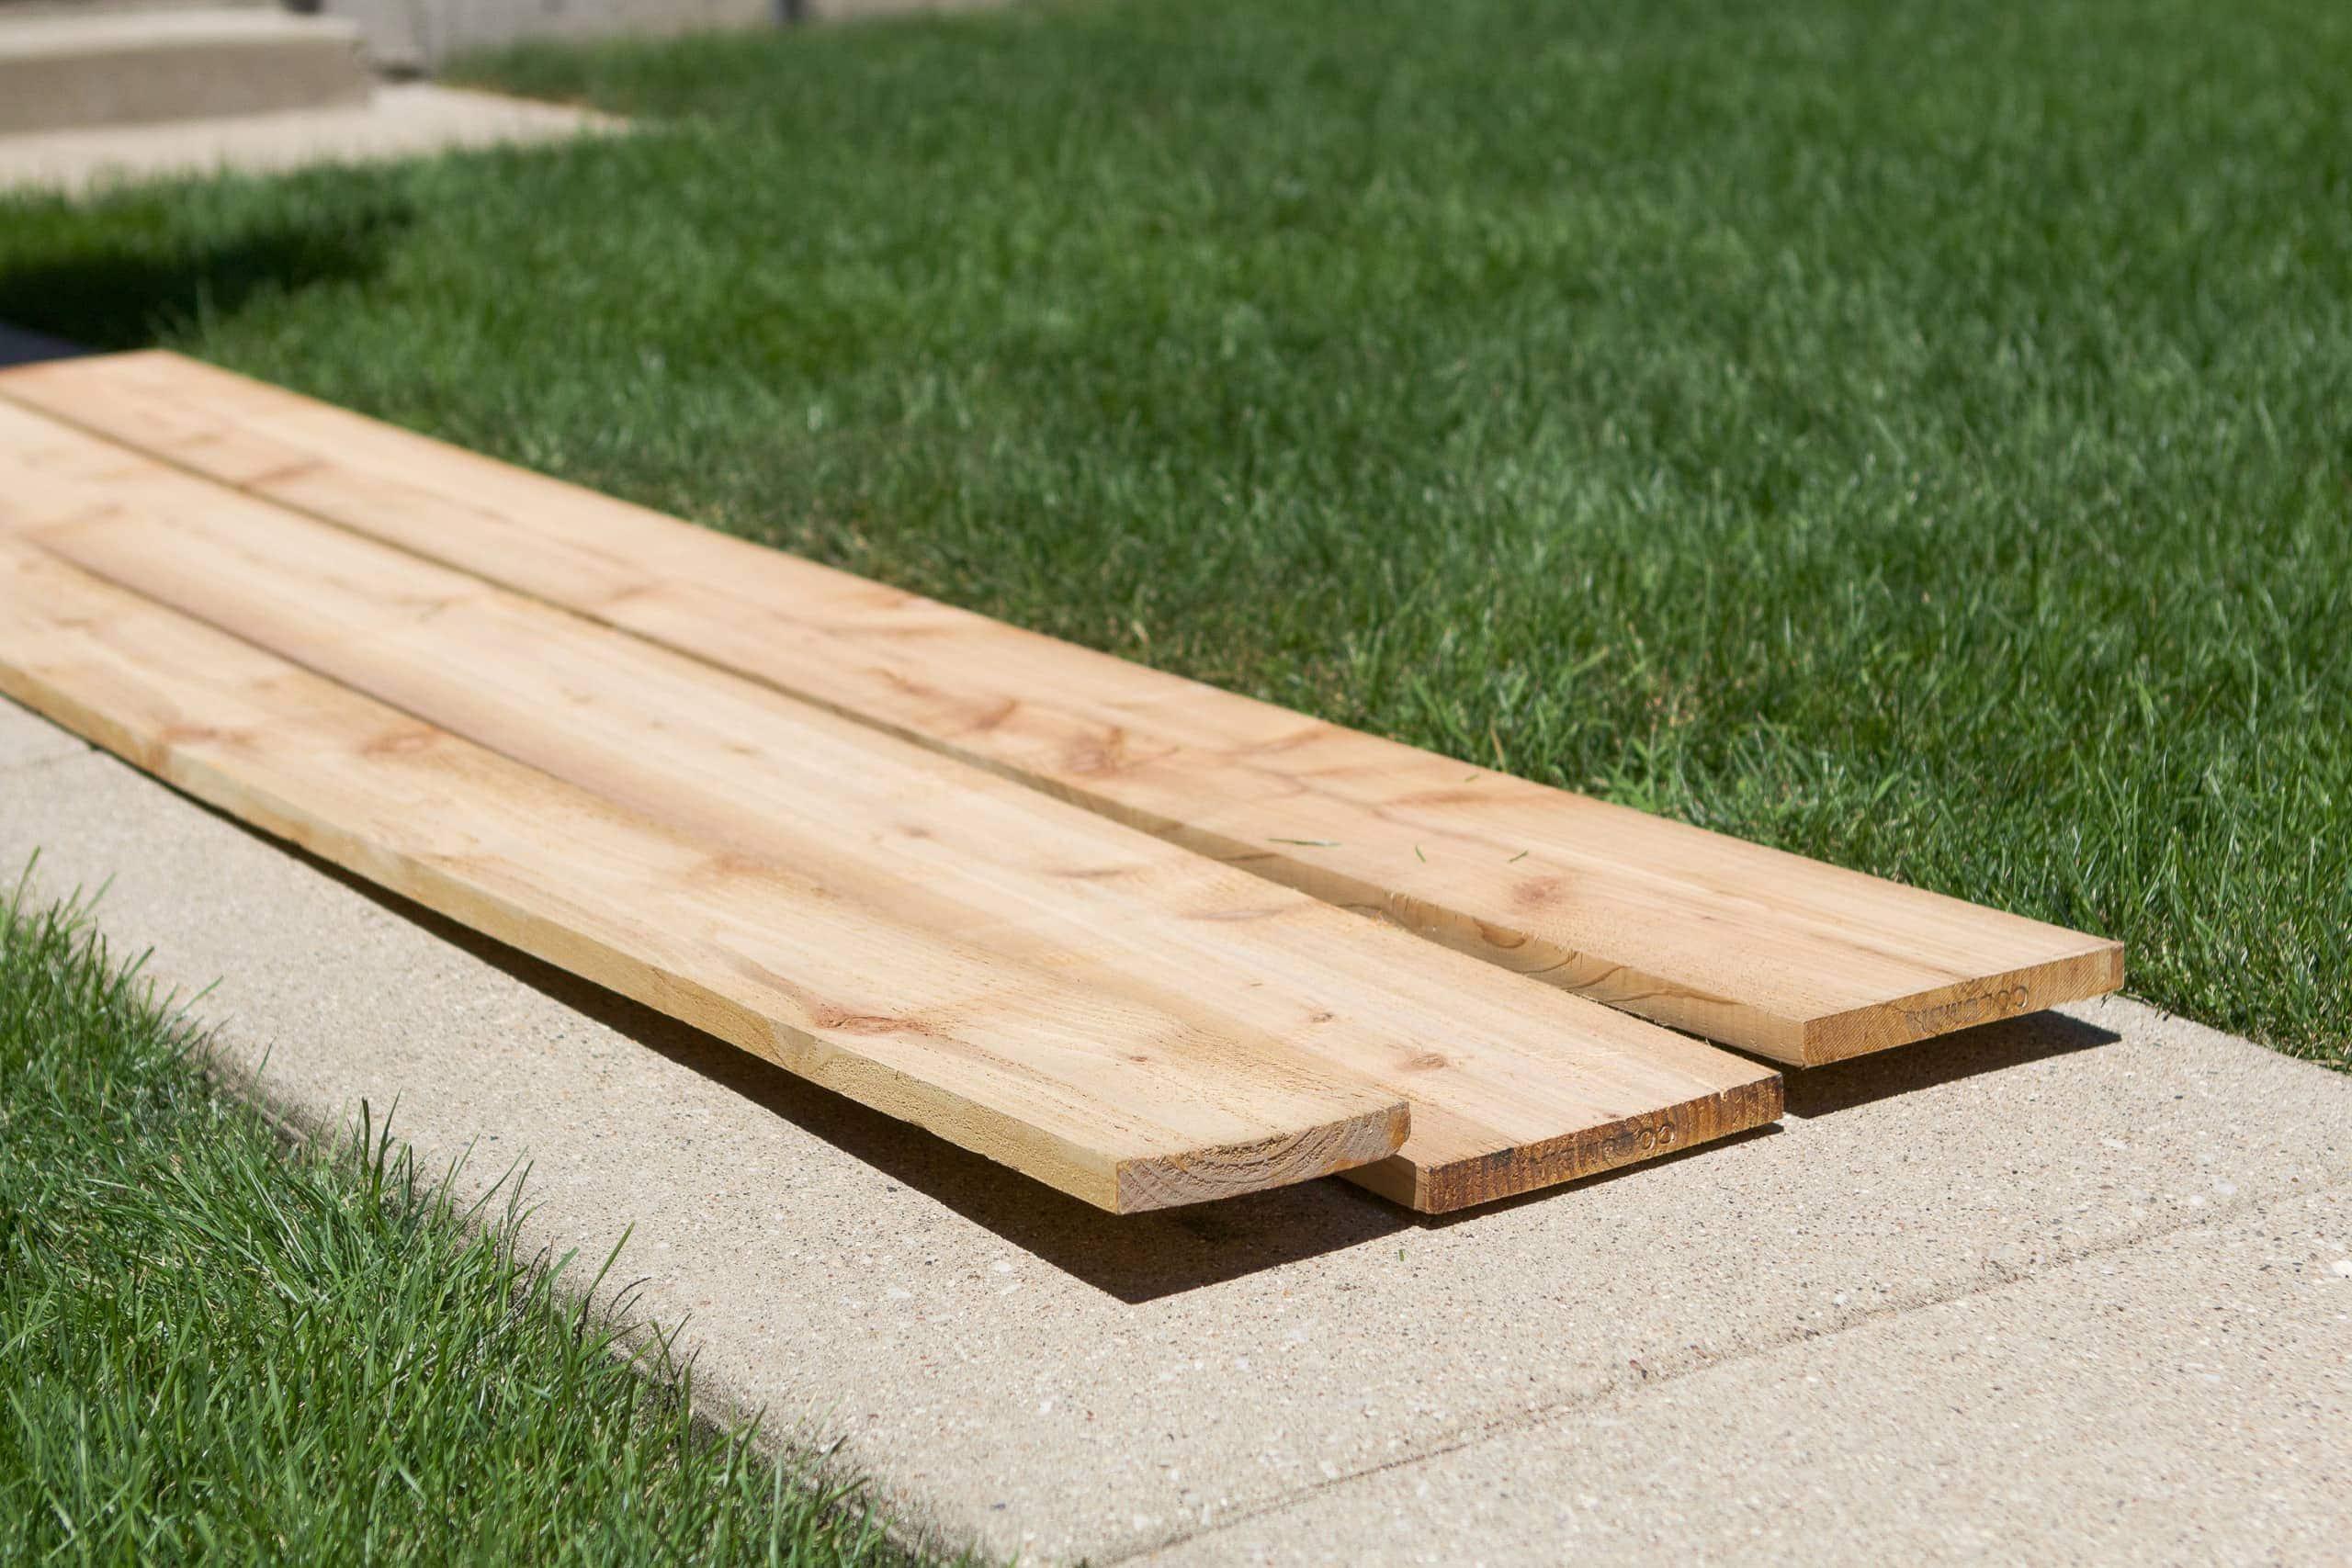 Wood used to build a window box